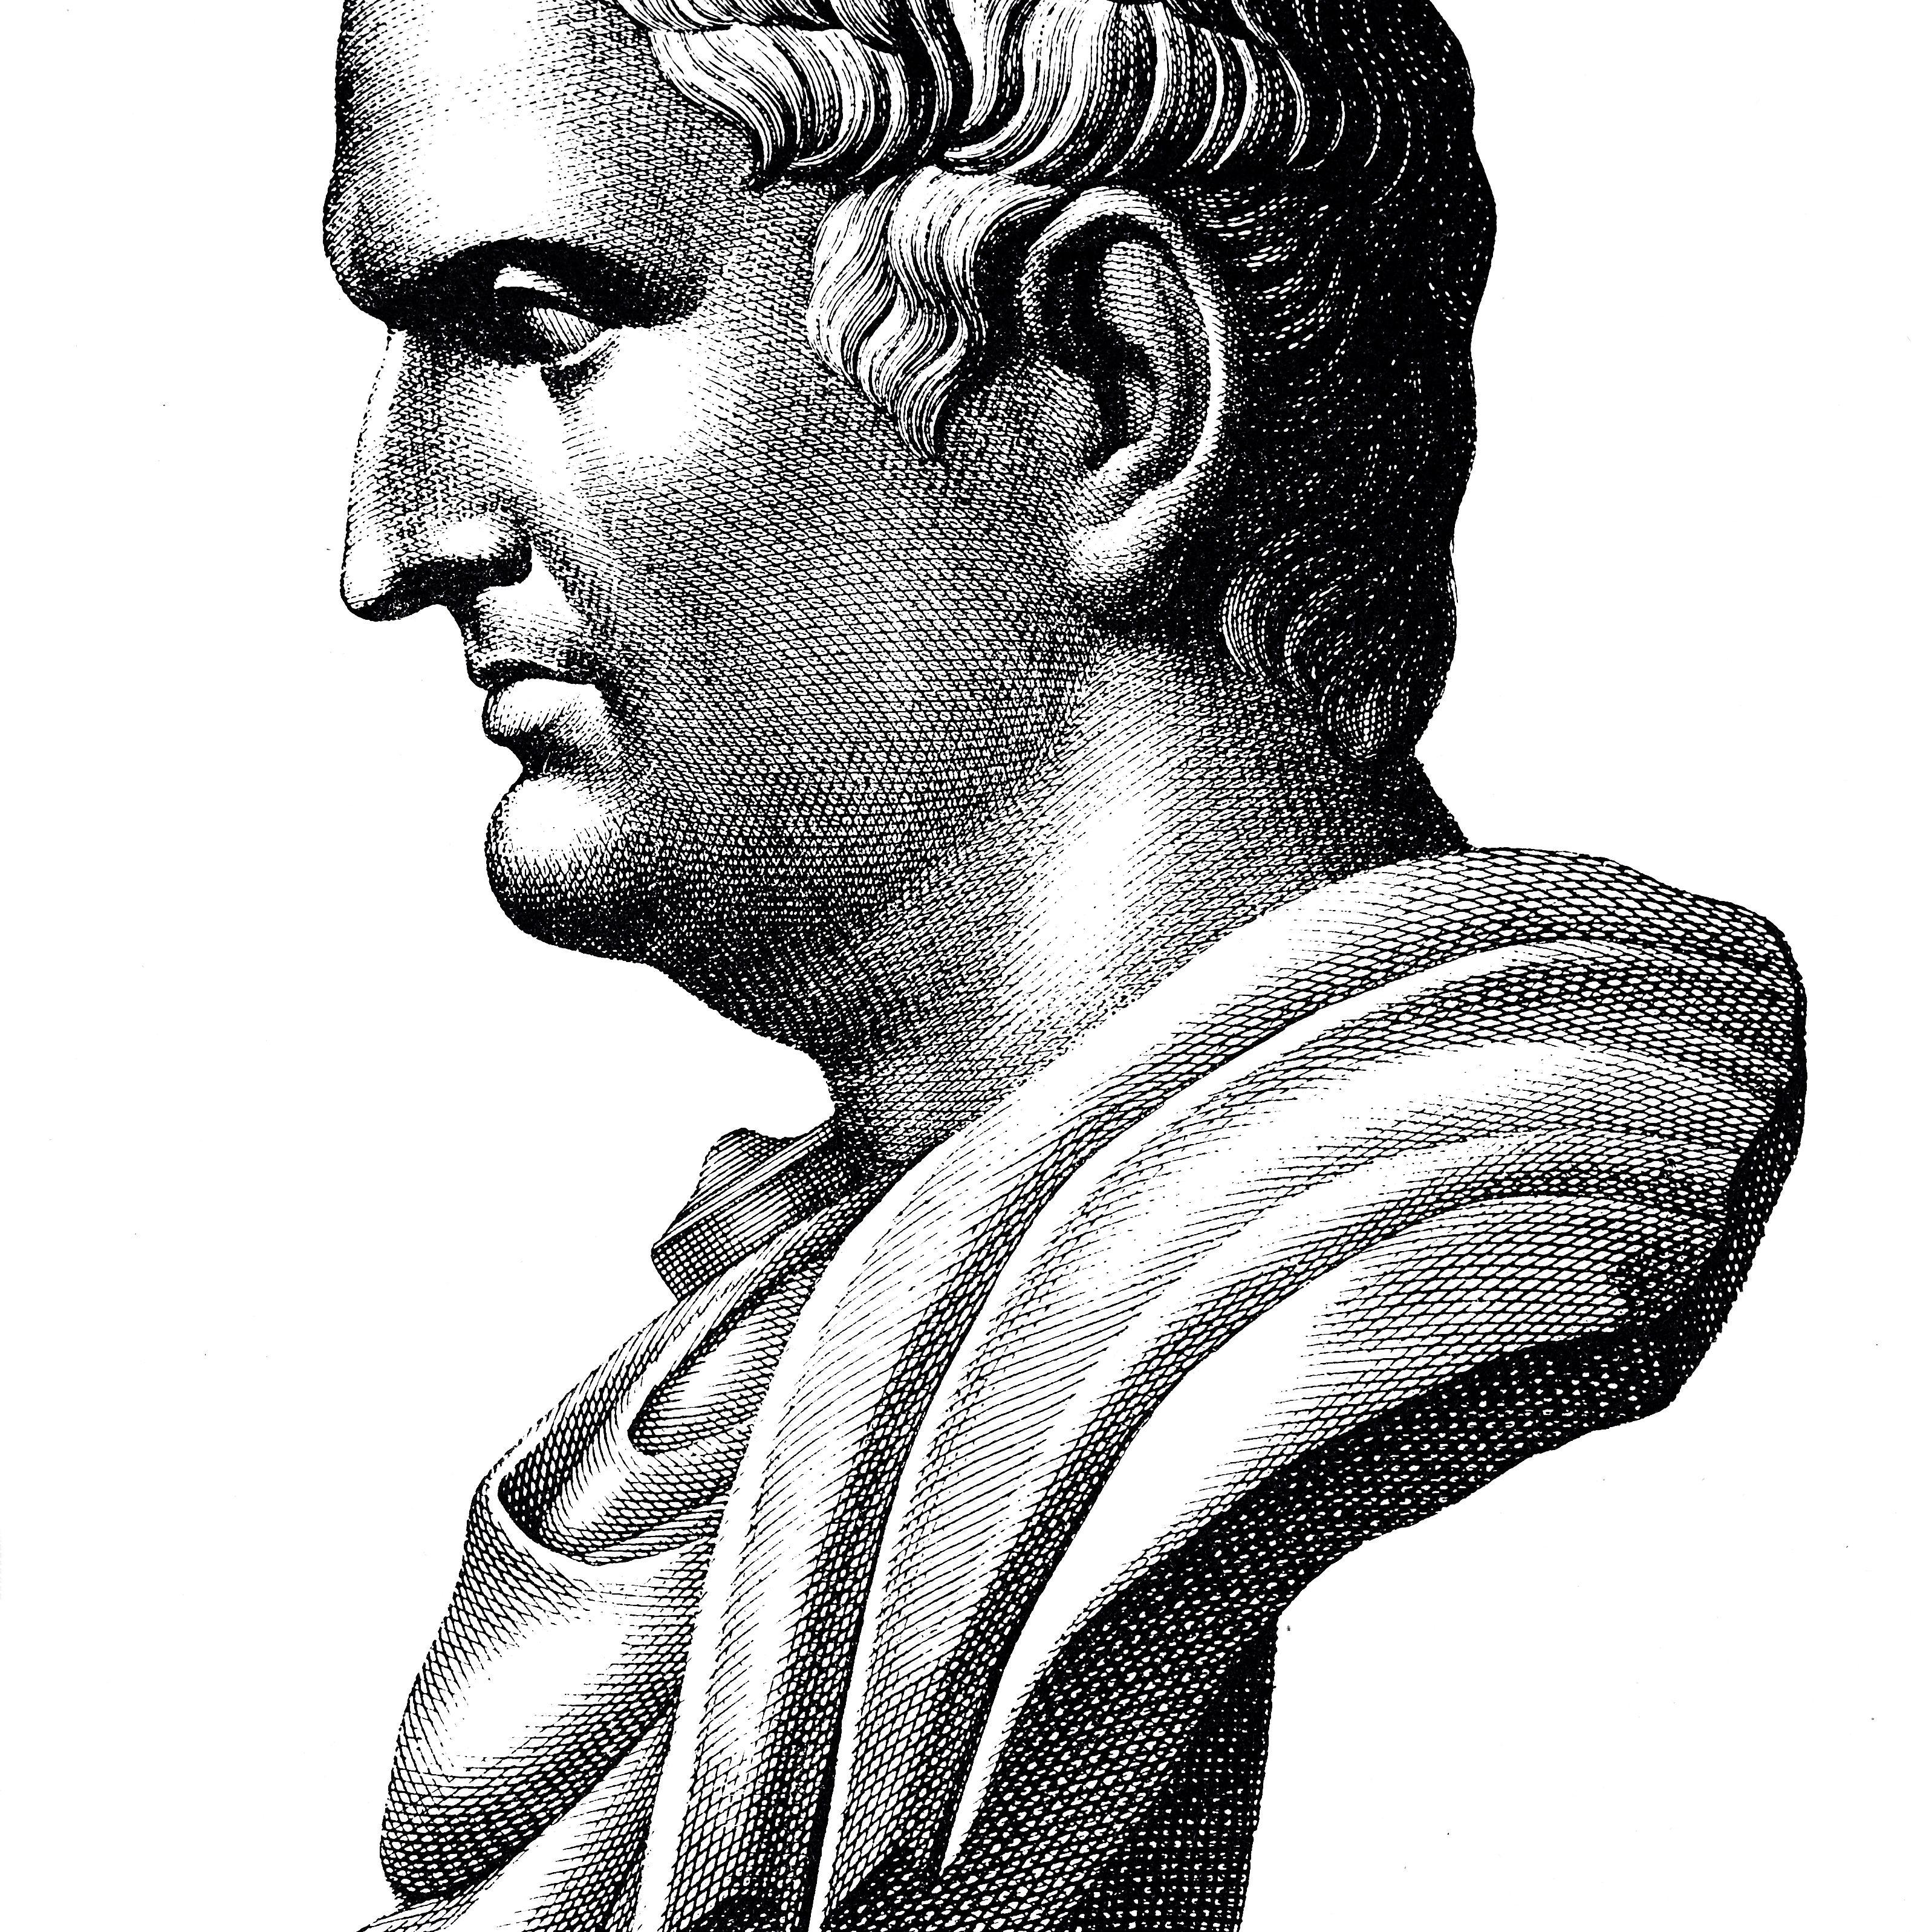 Bust of Marcus Antonius, roman politician and general